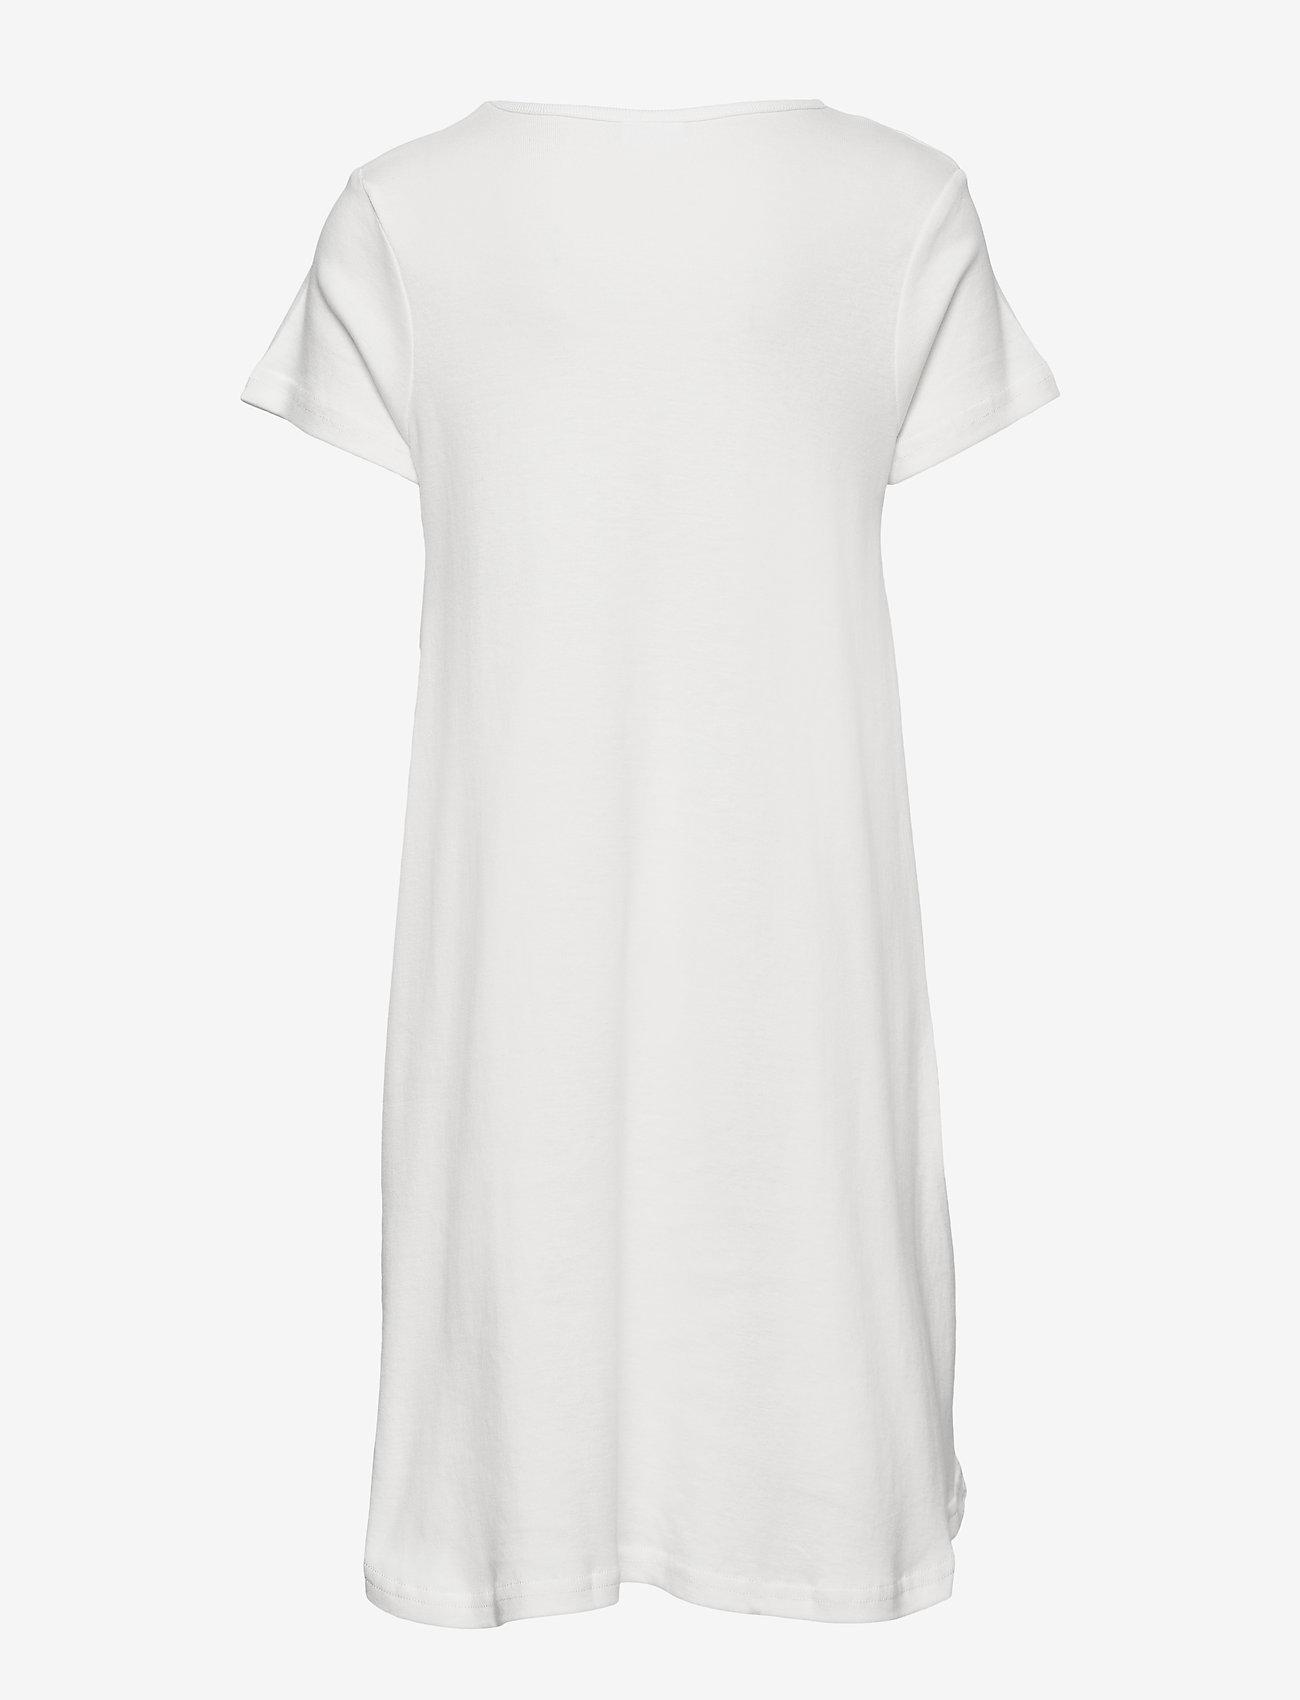 Martinex - PIPPI HUGS NIGHTGOWN - nat- & undertøj - white - 1